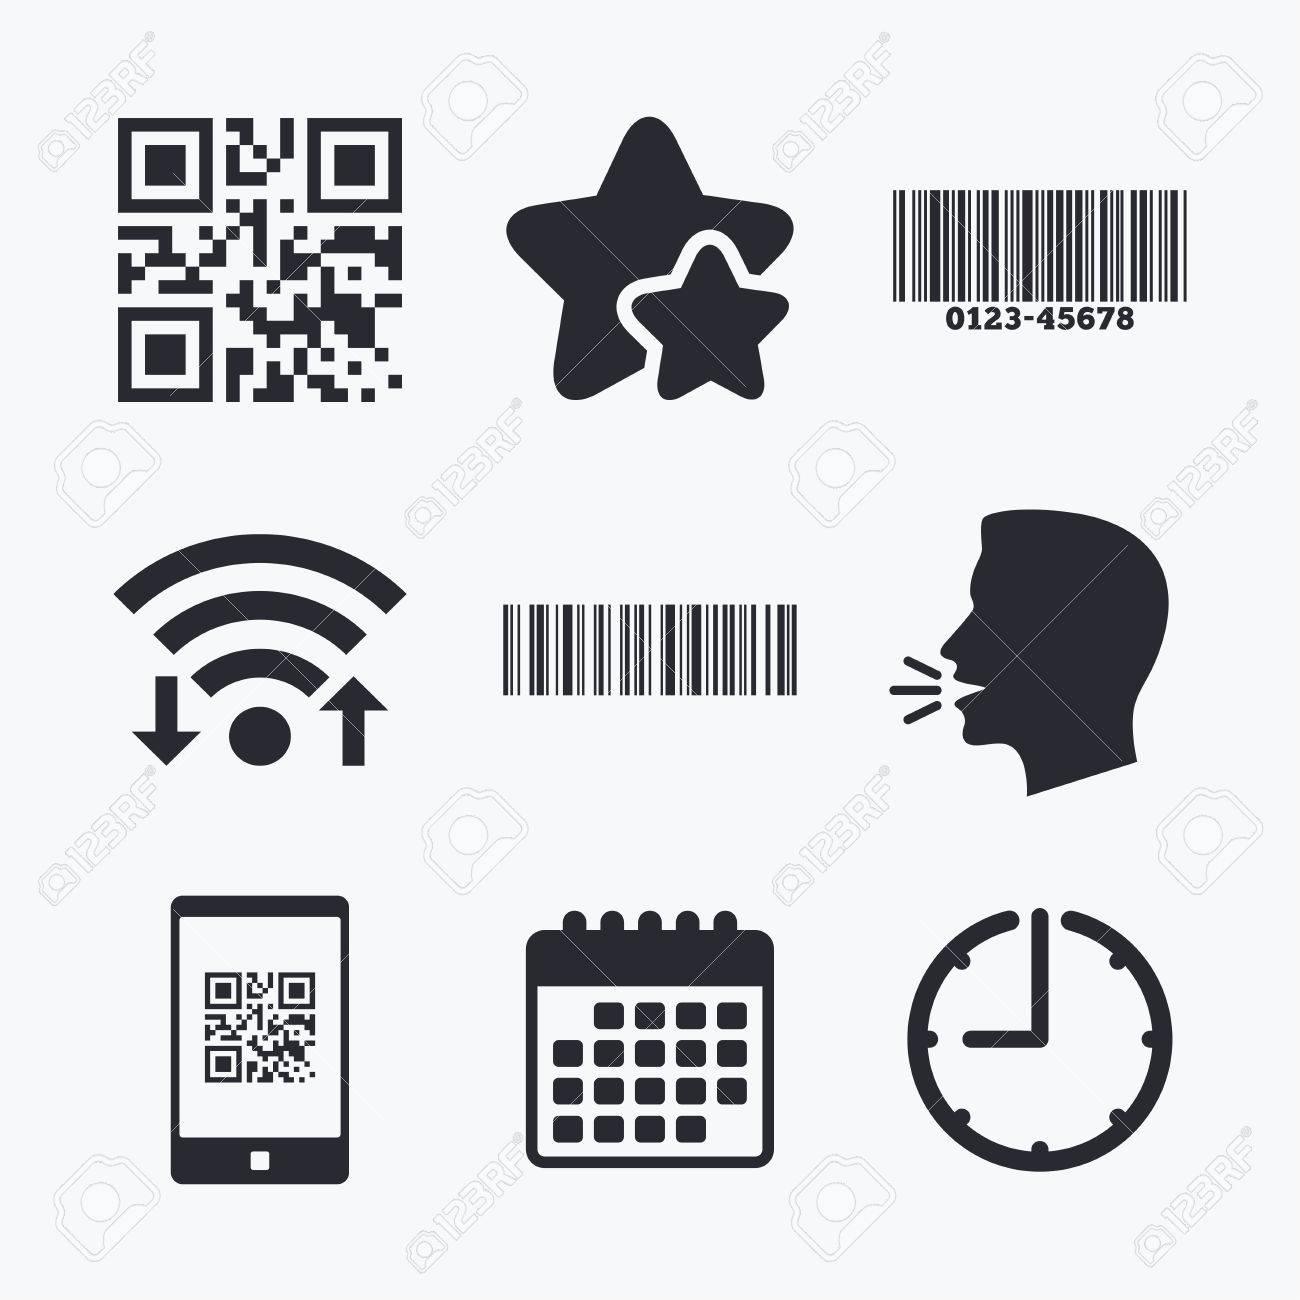 scan barcode in smartphone symbols wifi internet favorite